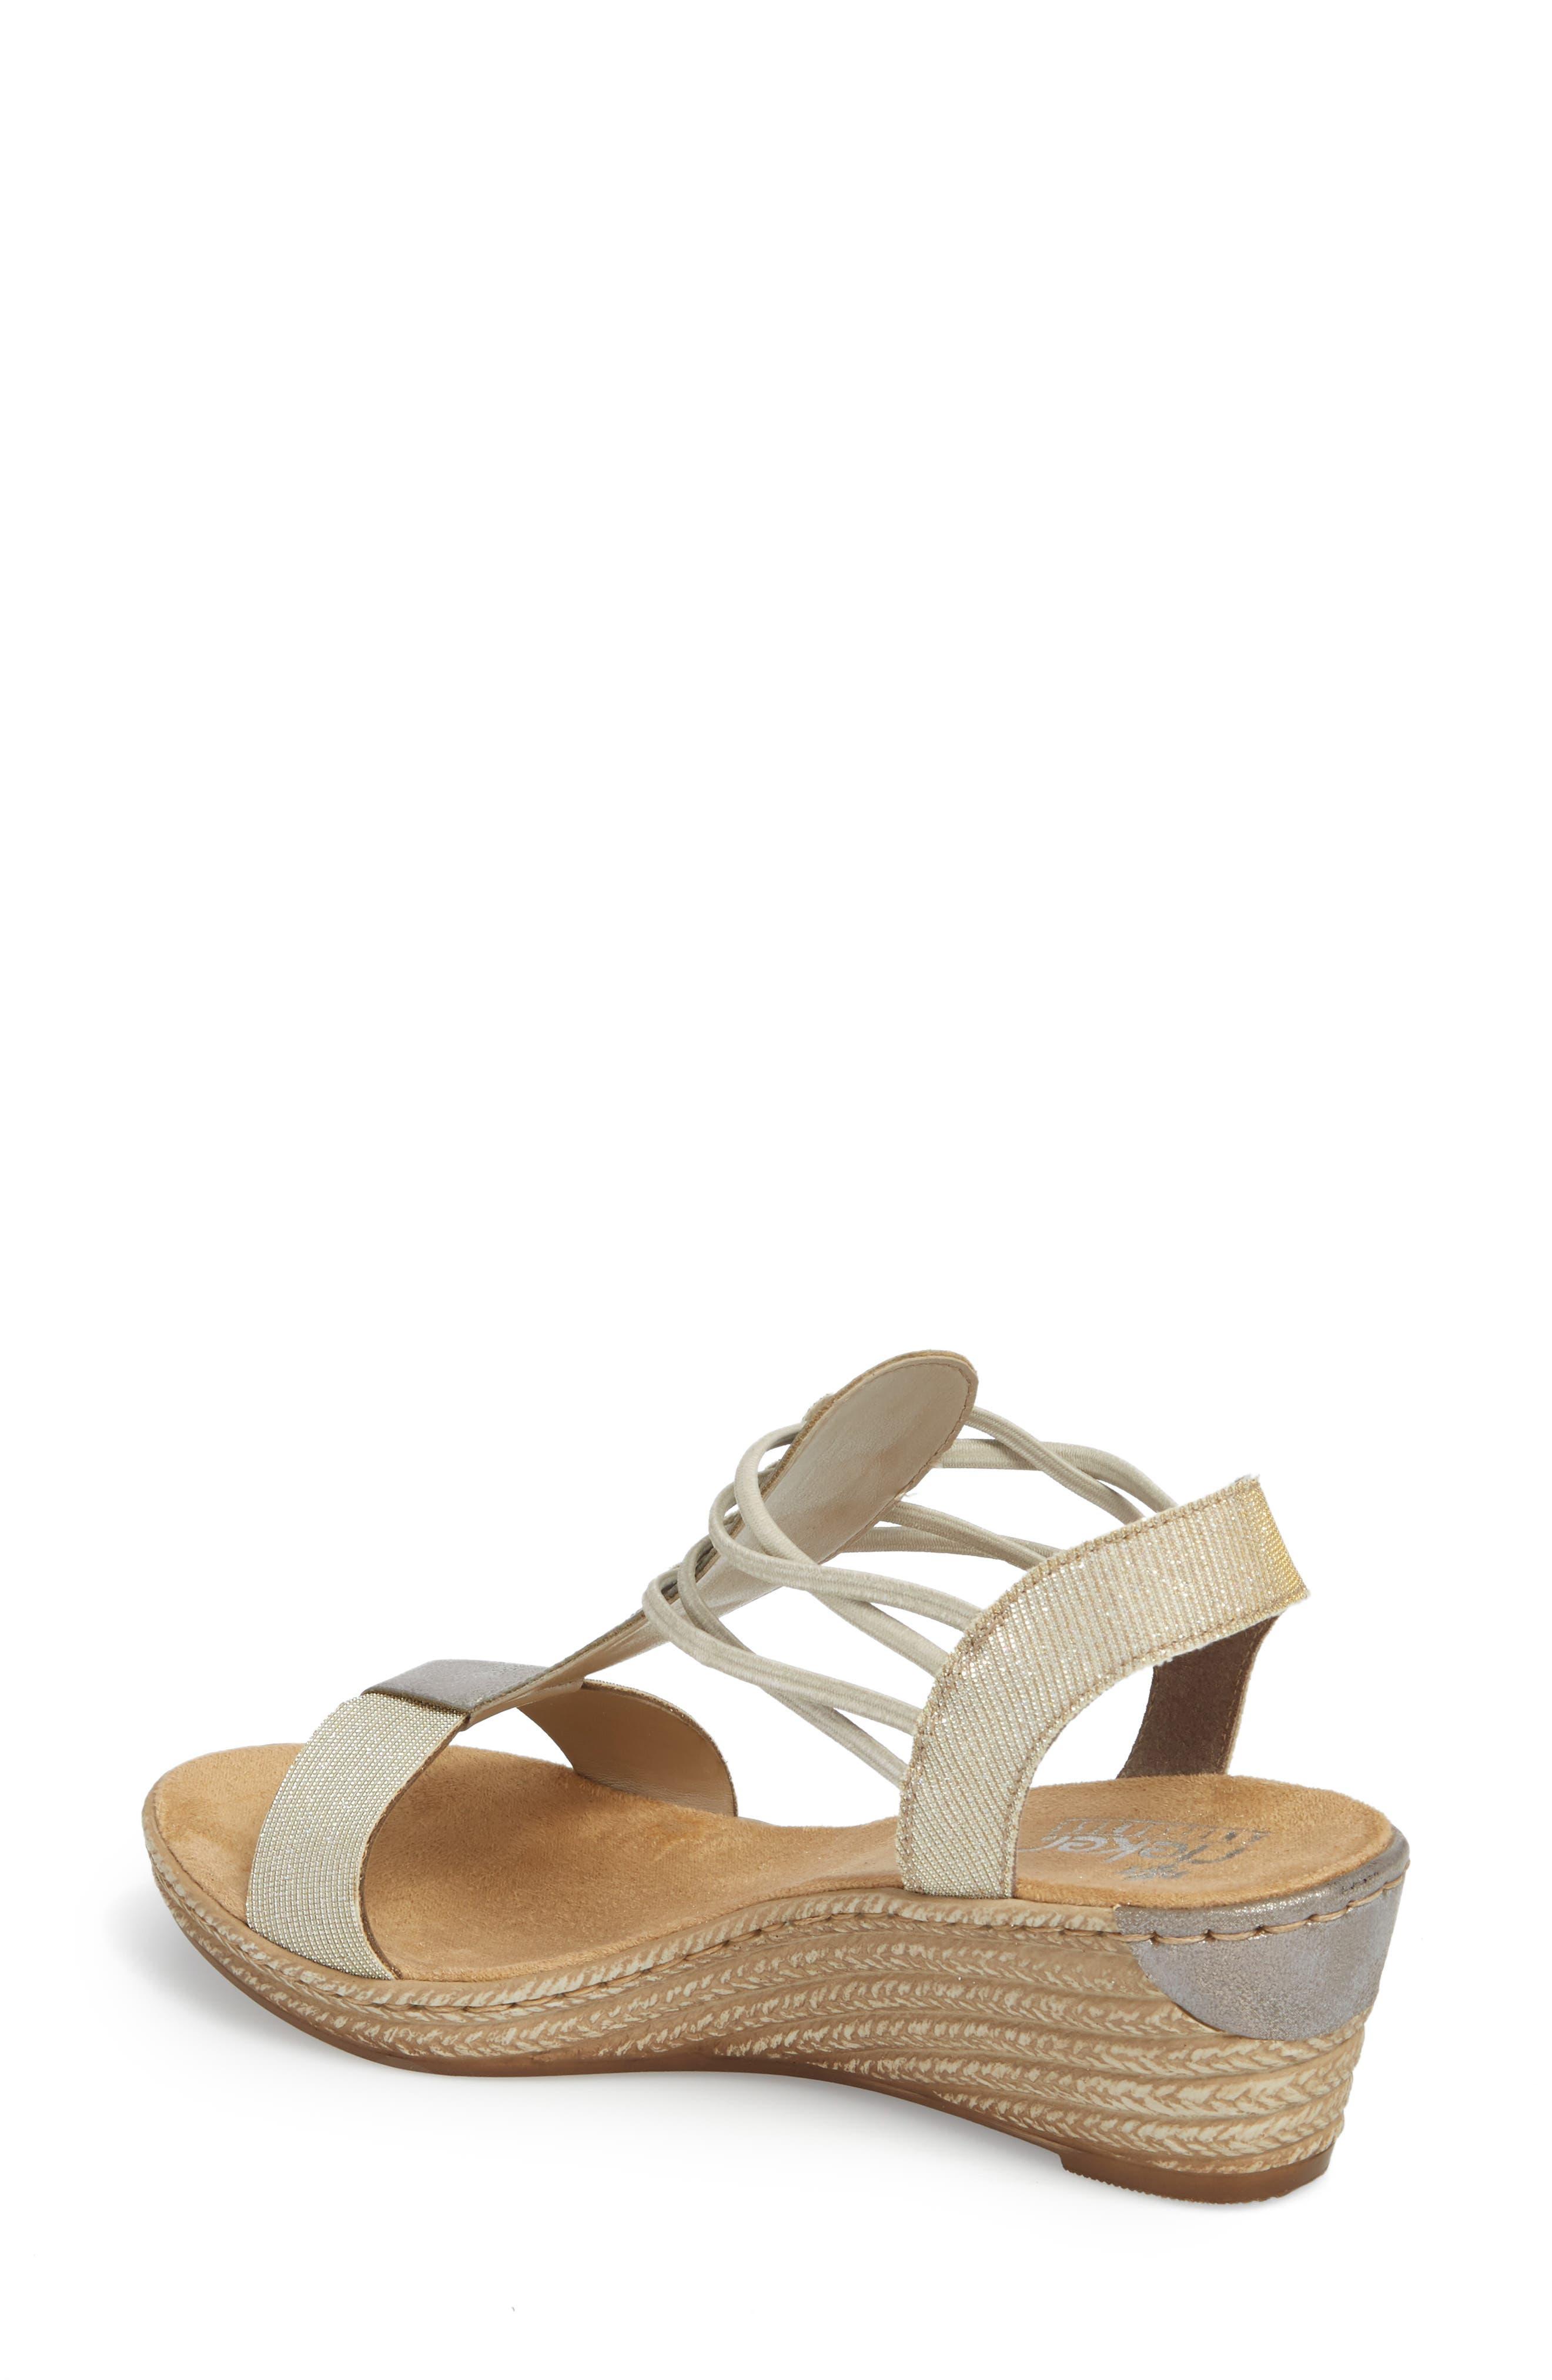 Fanni 22 Espadrille Wedge Sandal,                             Alternate thumbnail 2, color,                             Light Gold/ Grey Fabric